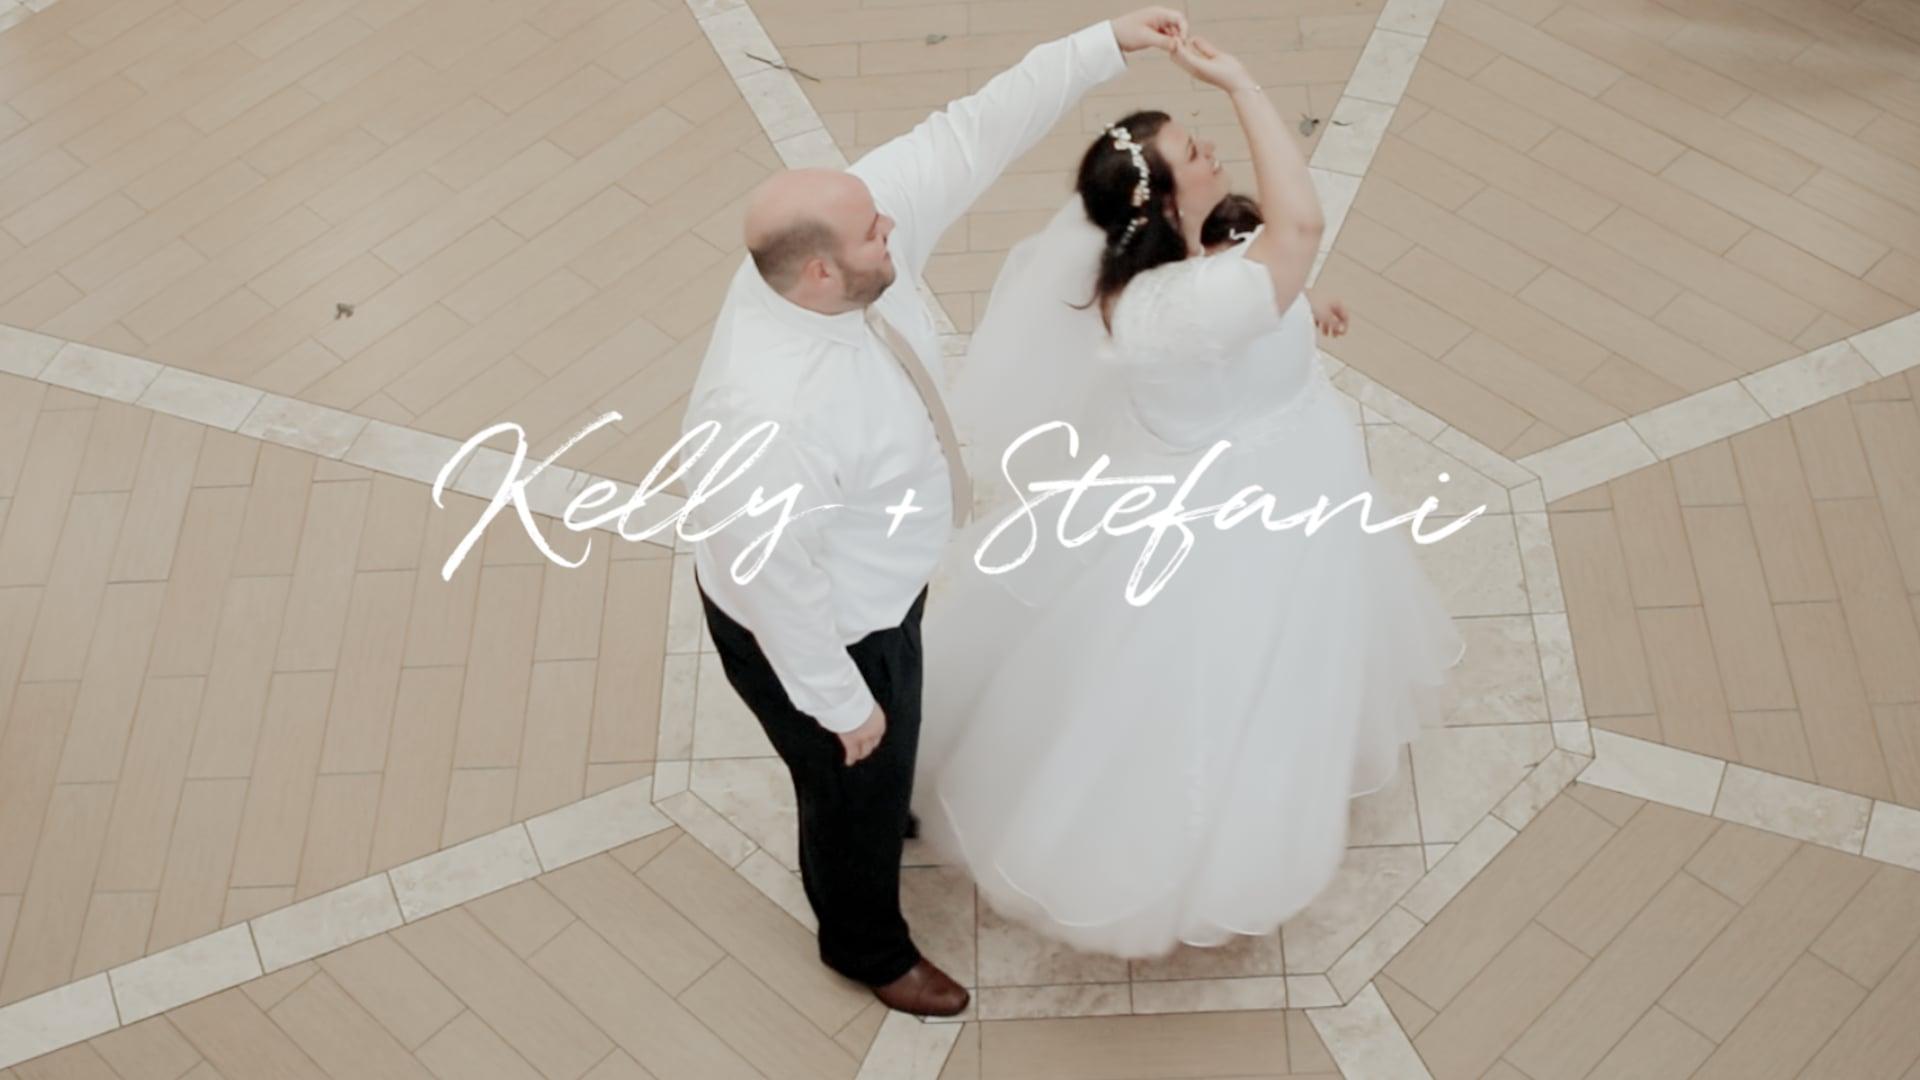 Kelly + Stefani // Reception